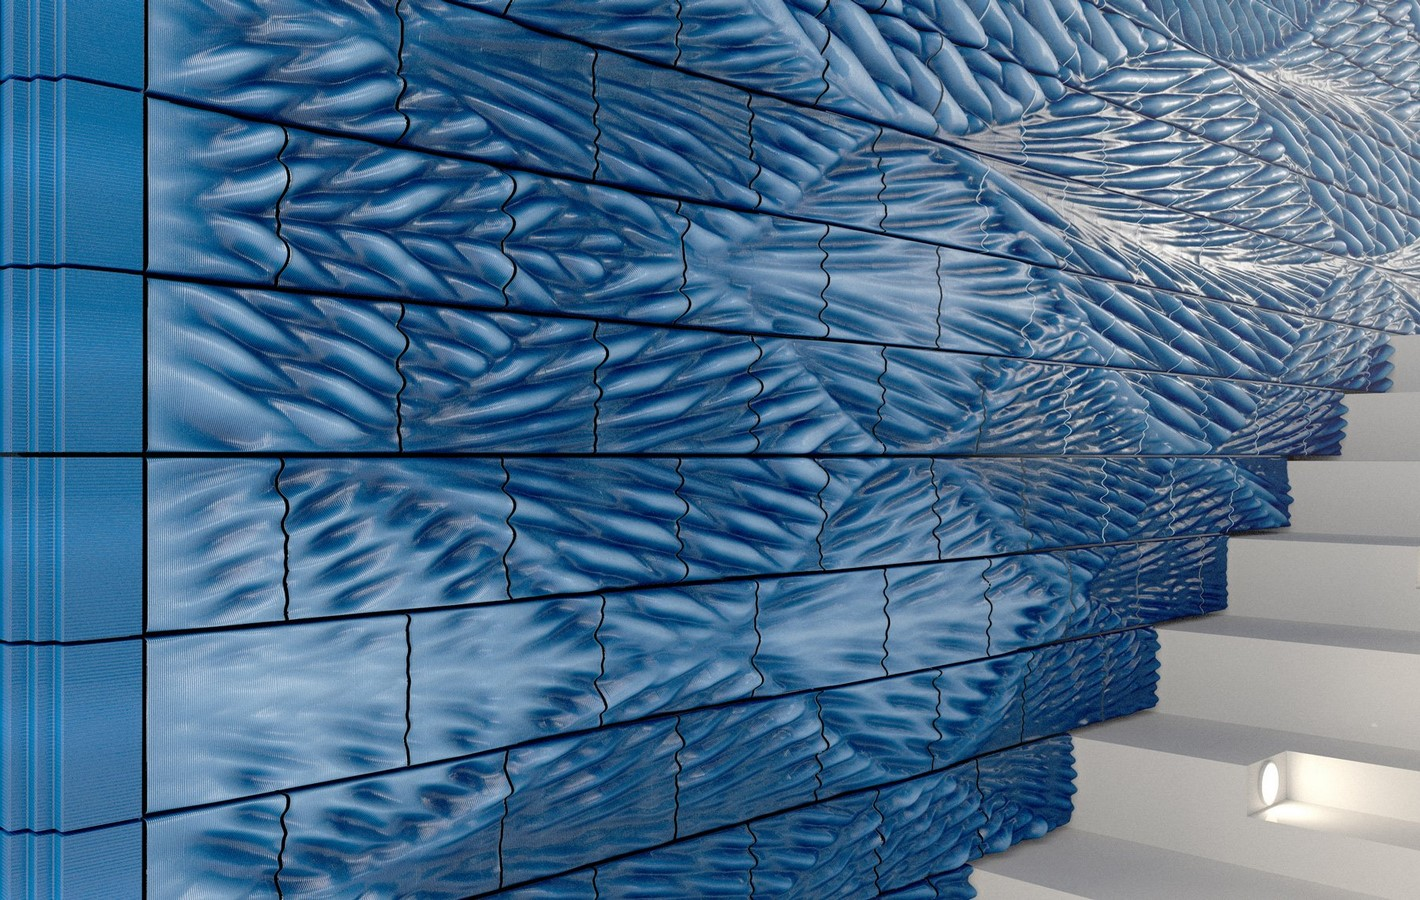 'New delft blue' 3D-printed ceramic tiles by studio RAP - Sheet3